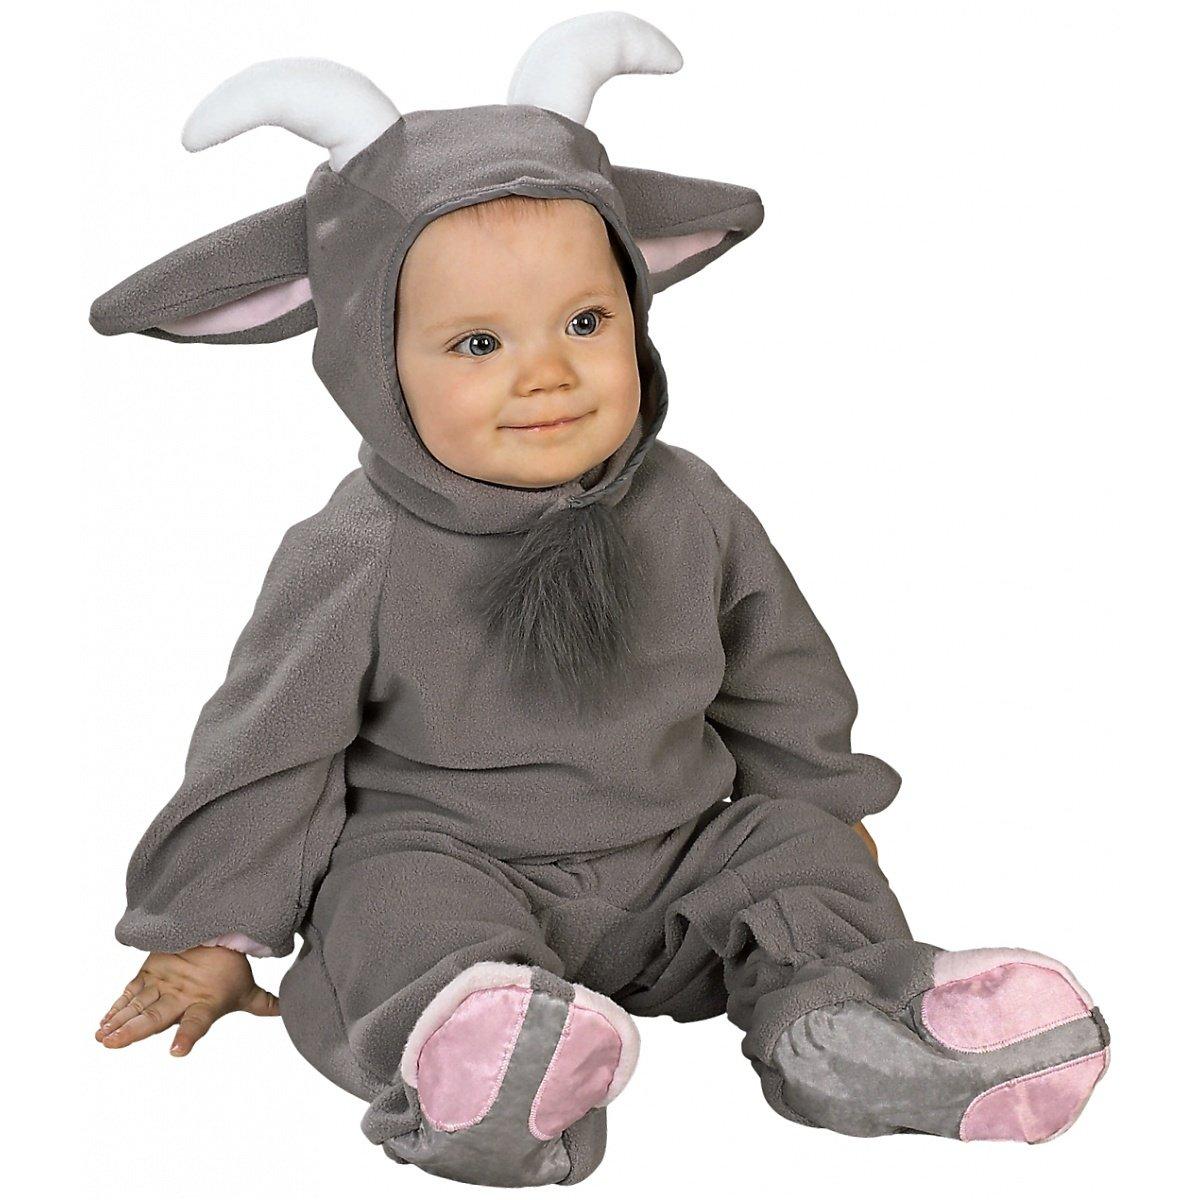 Billy the Goat - Newborn